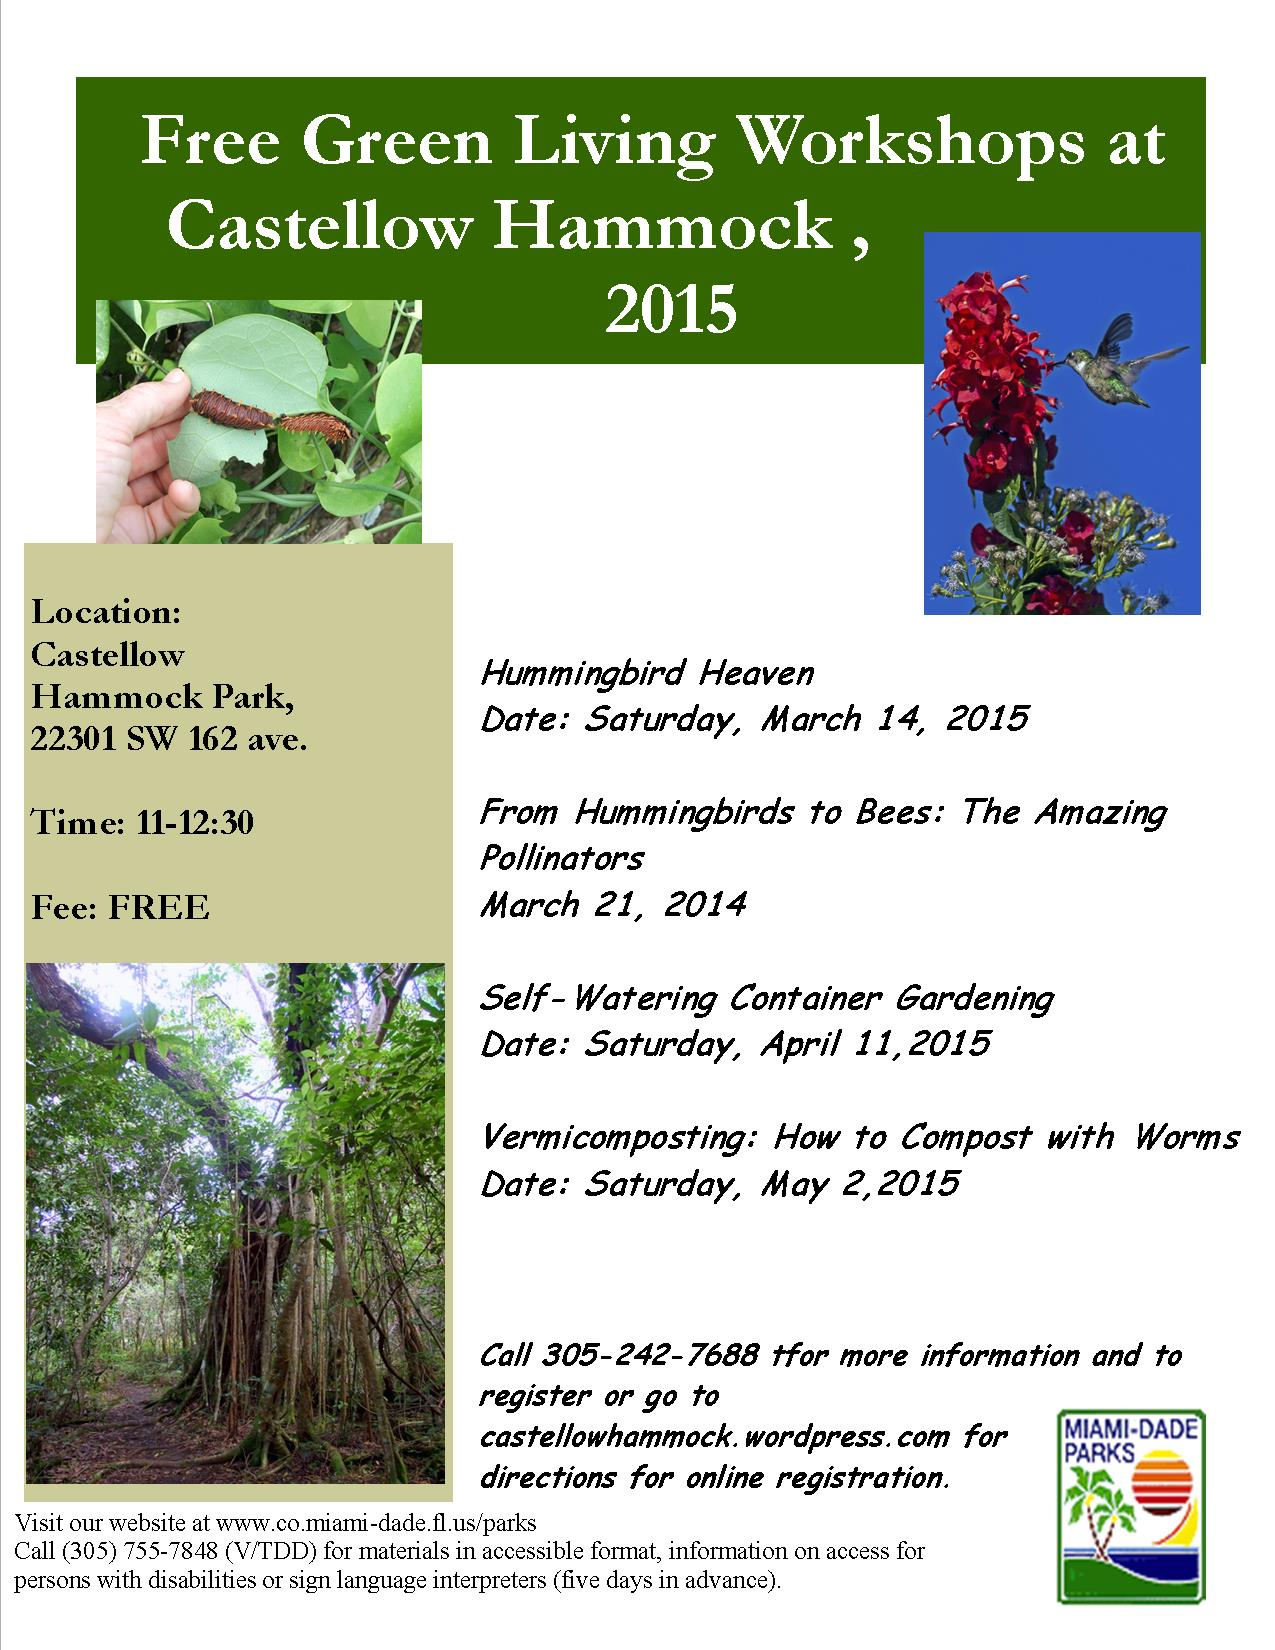 Castellow Hammock Nature Center